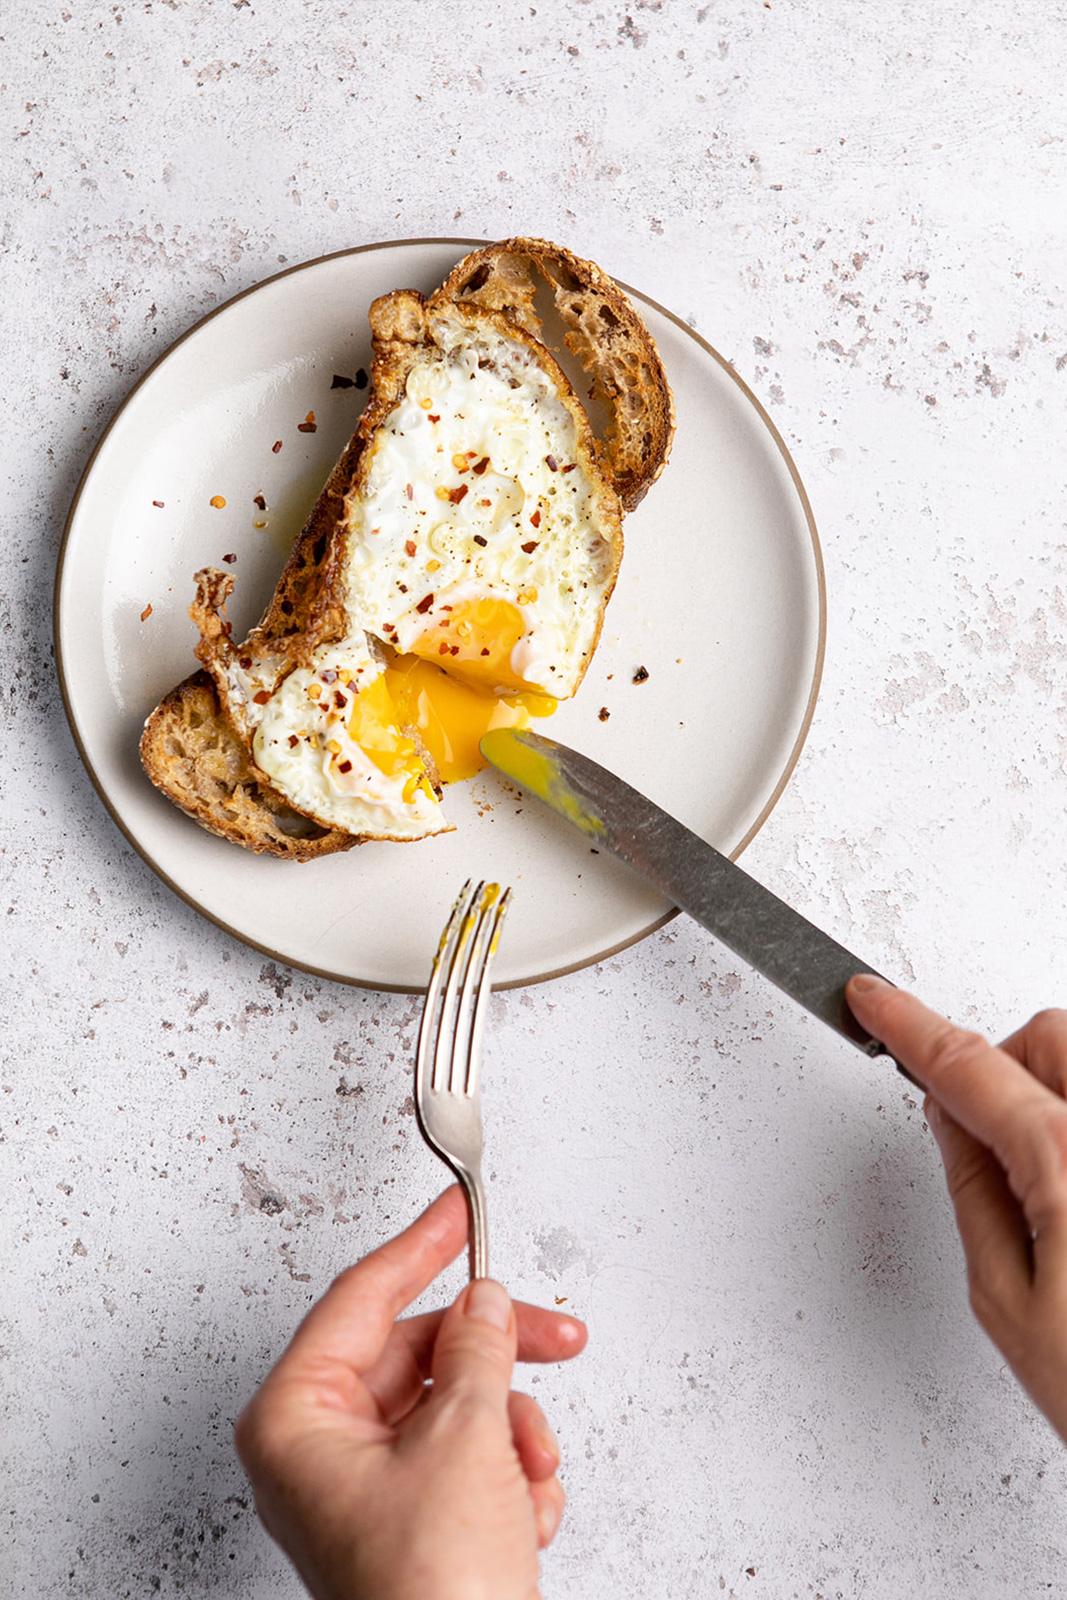 leanne citrone egg on toast